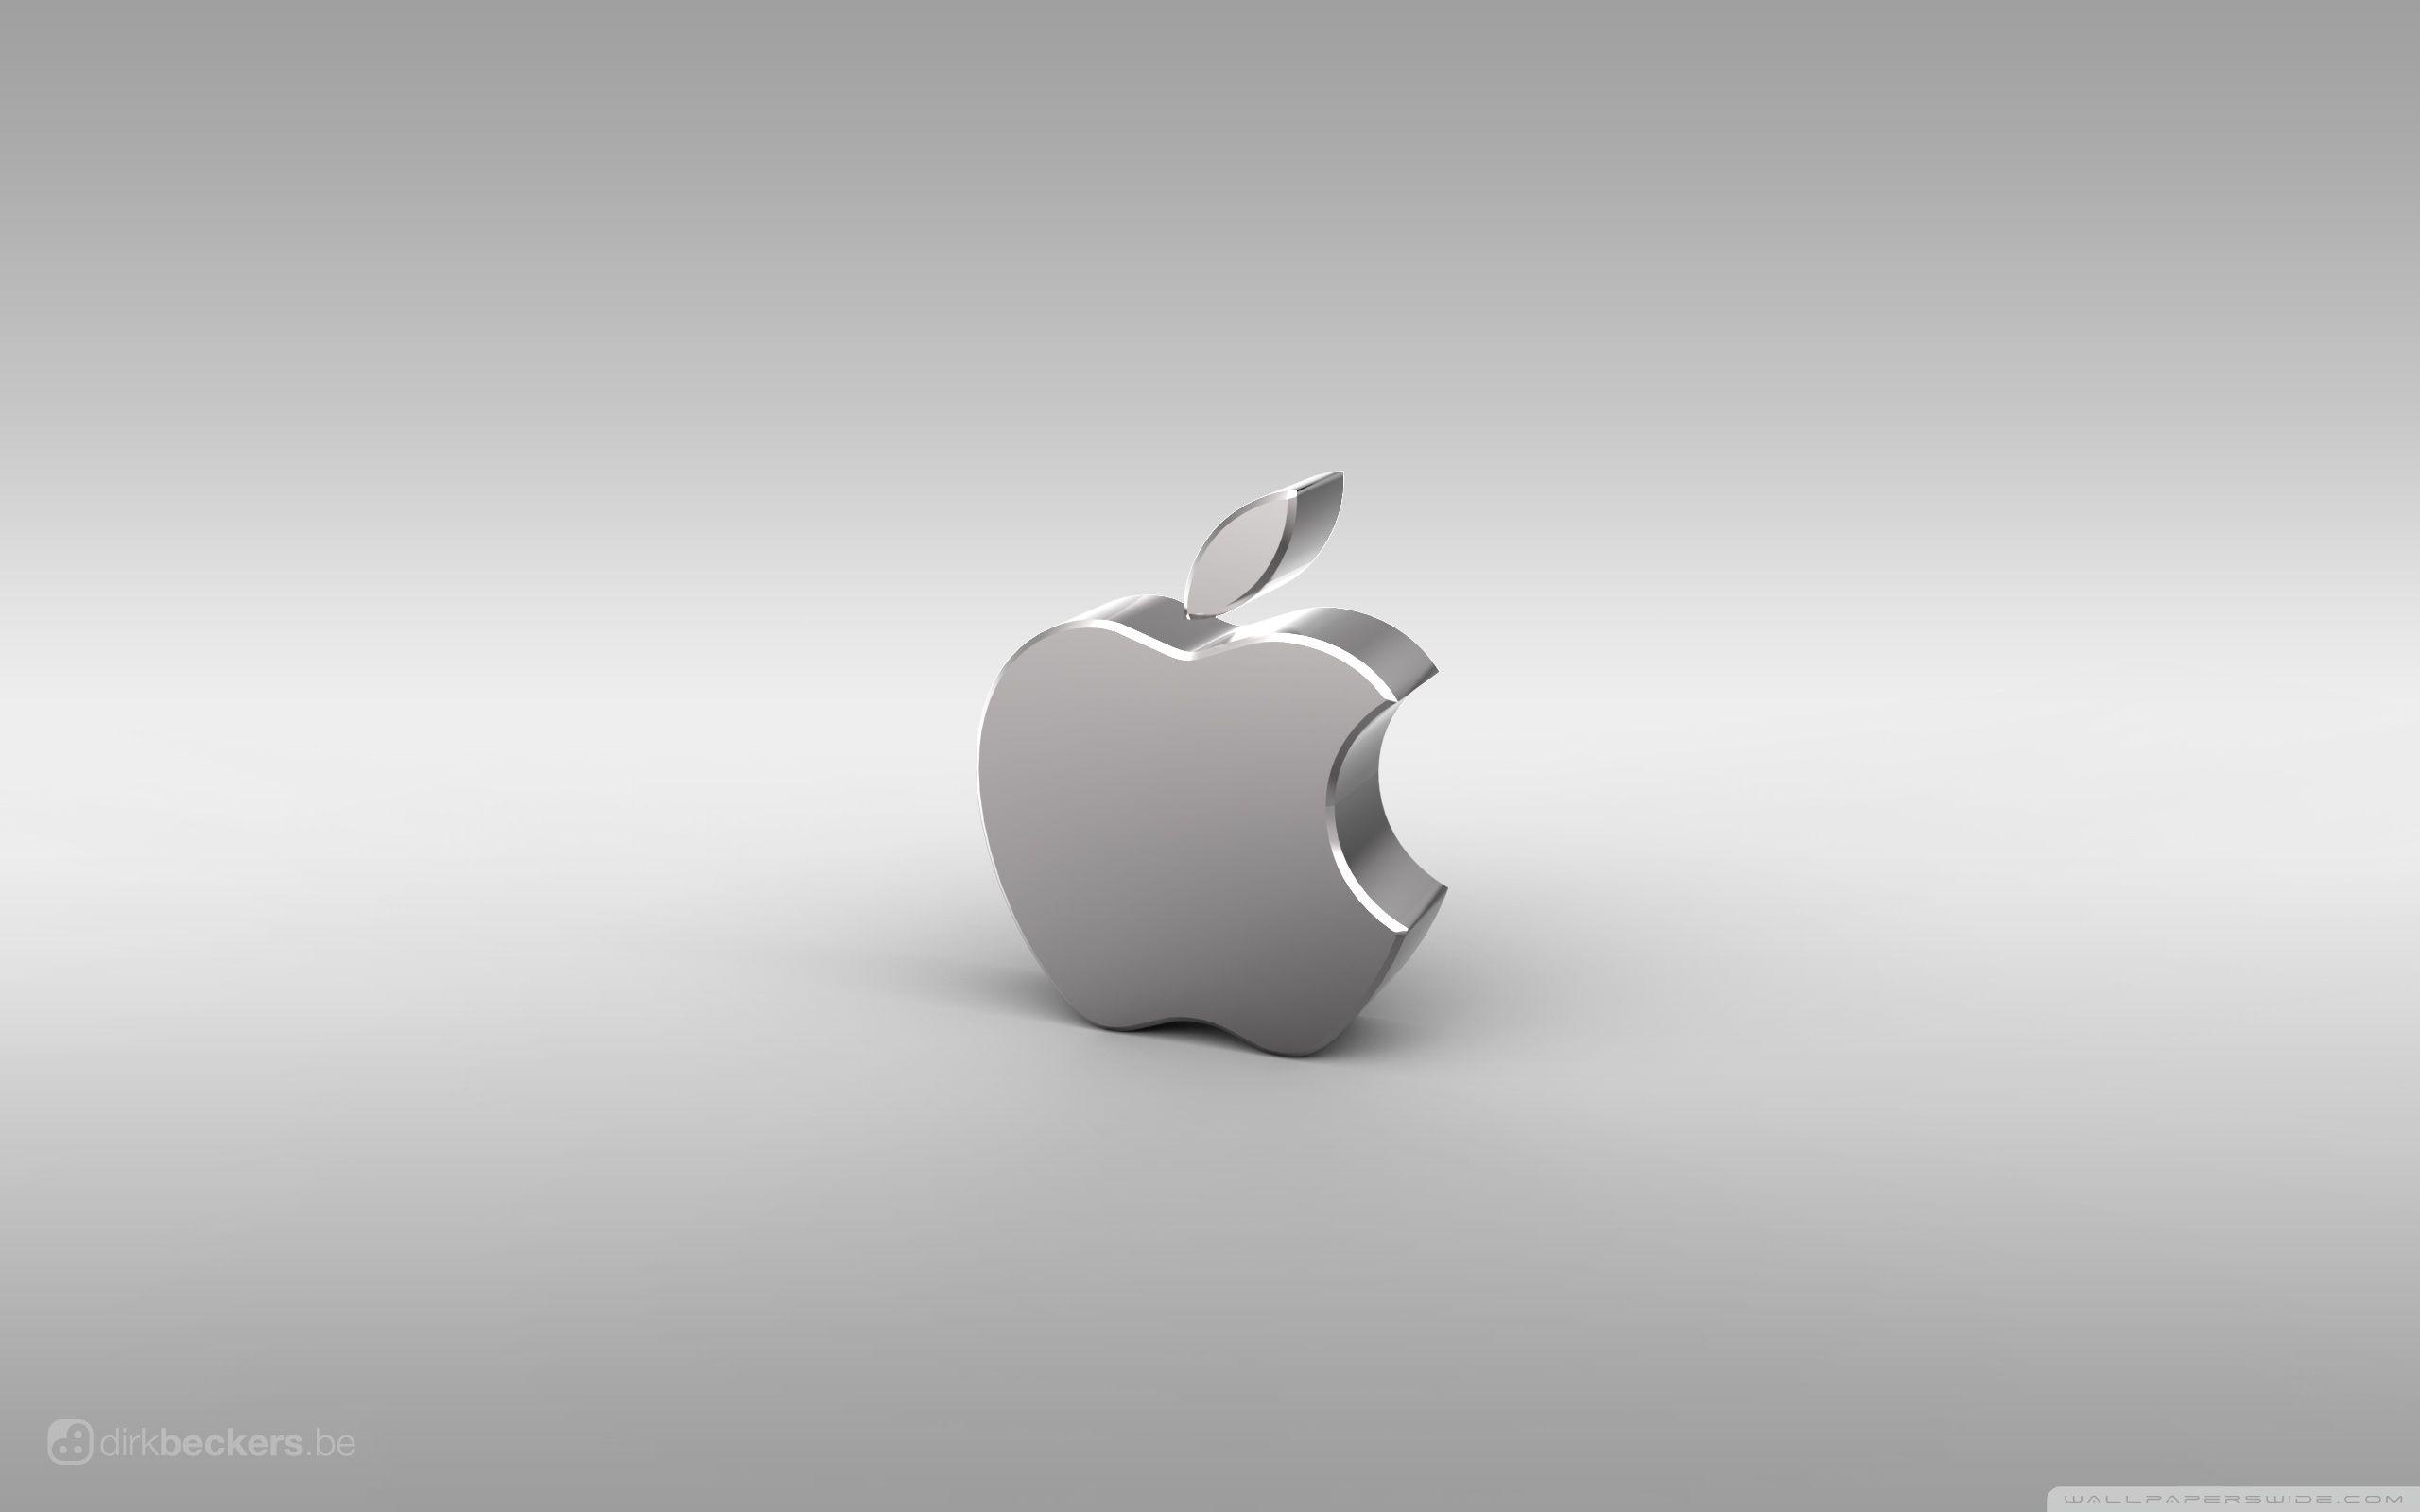 Something Silver Silver Wallpaper Hd Silver Wallpaper Apple Logo Wallpaper